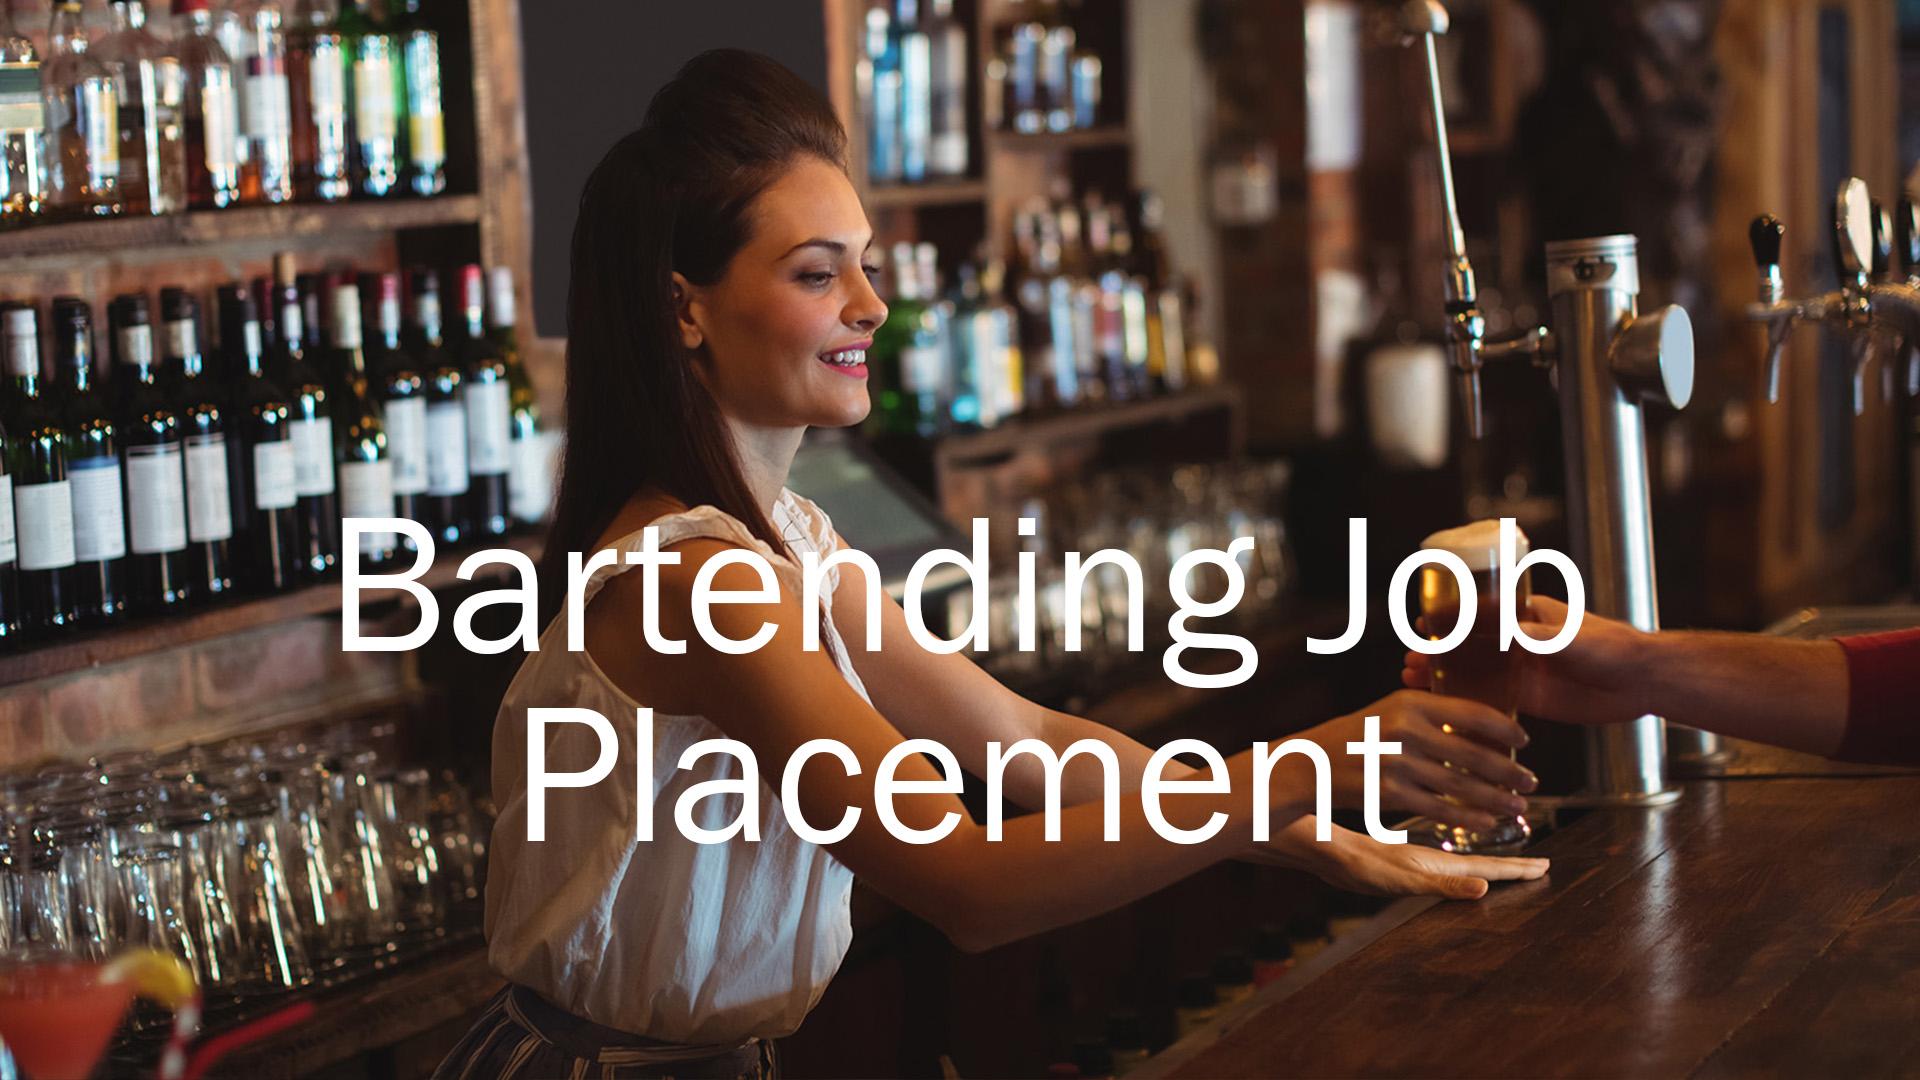 bartender jobs minneapolis st paul mn school of bartending placement